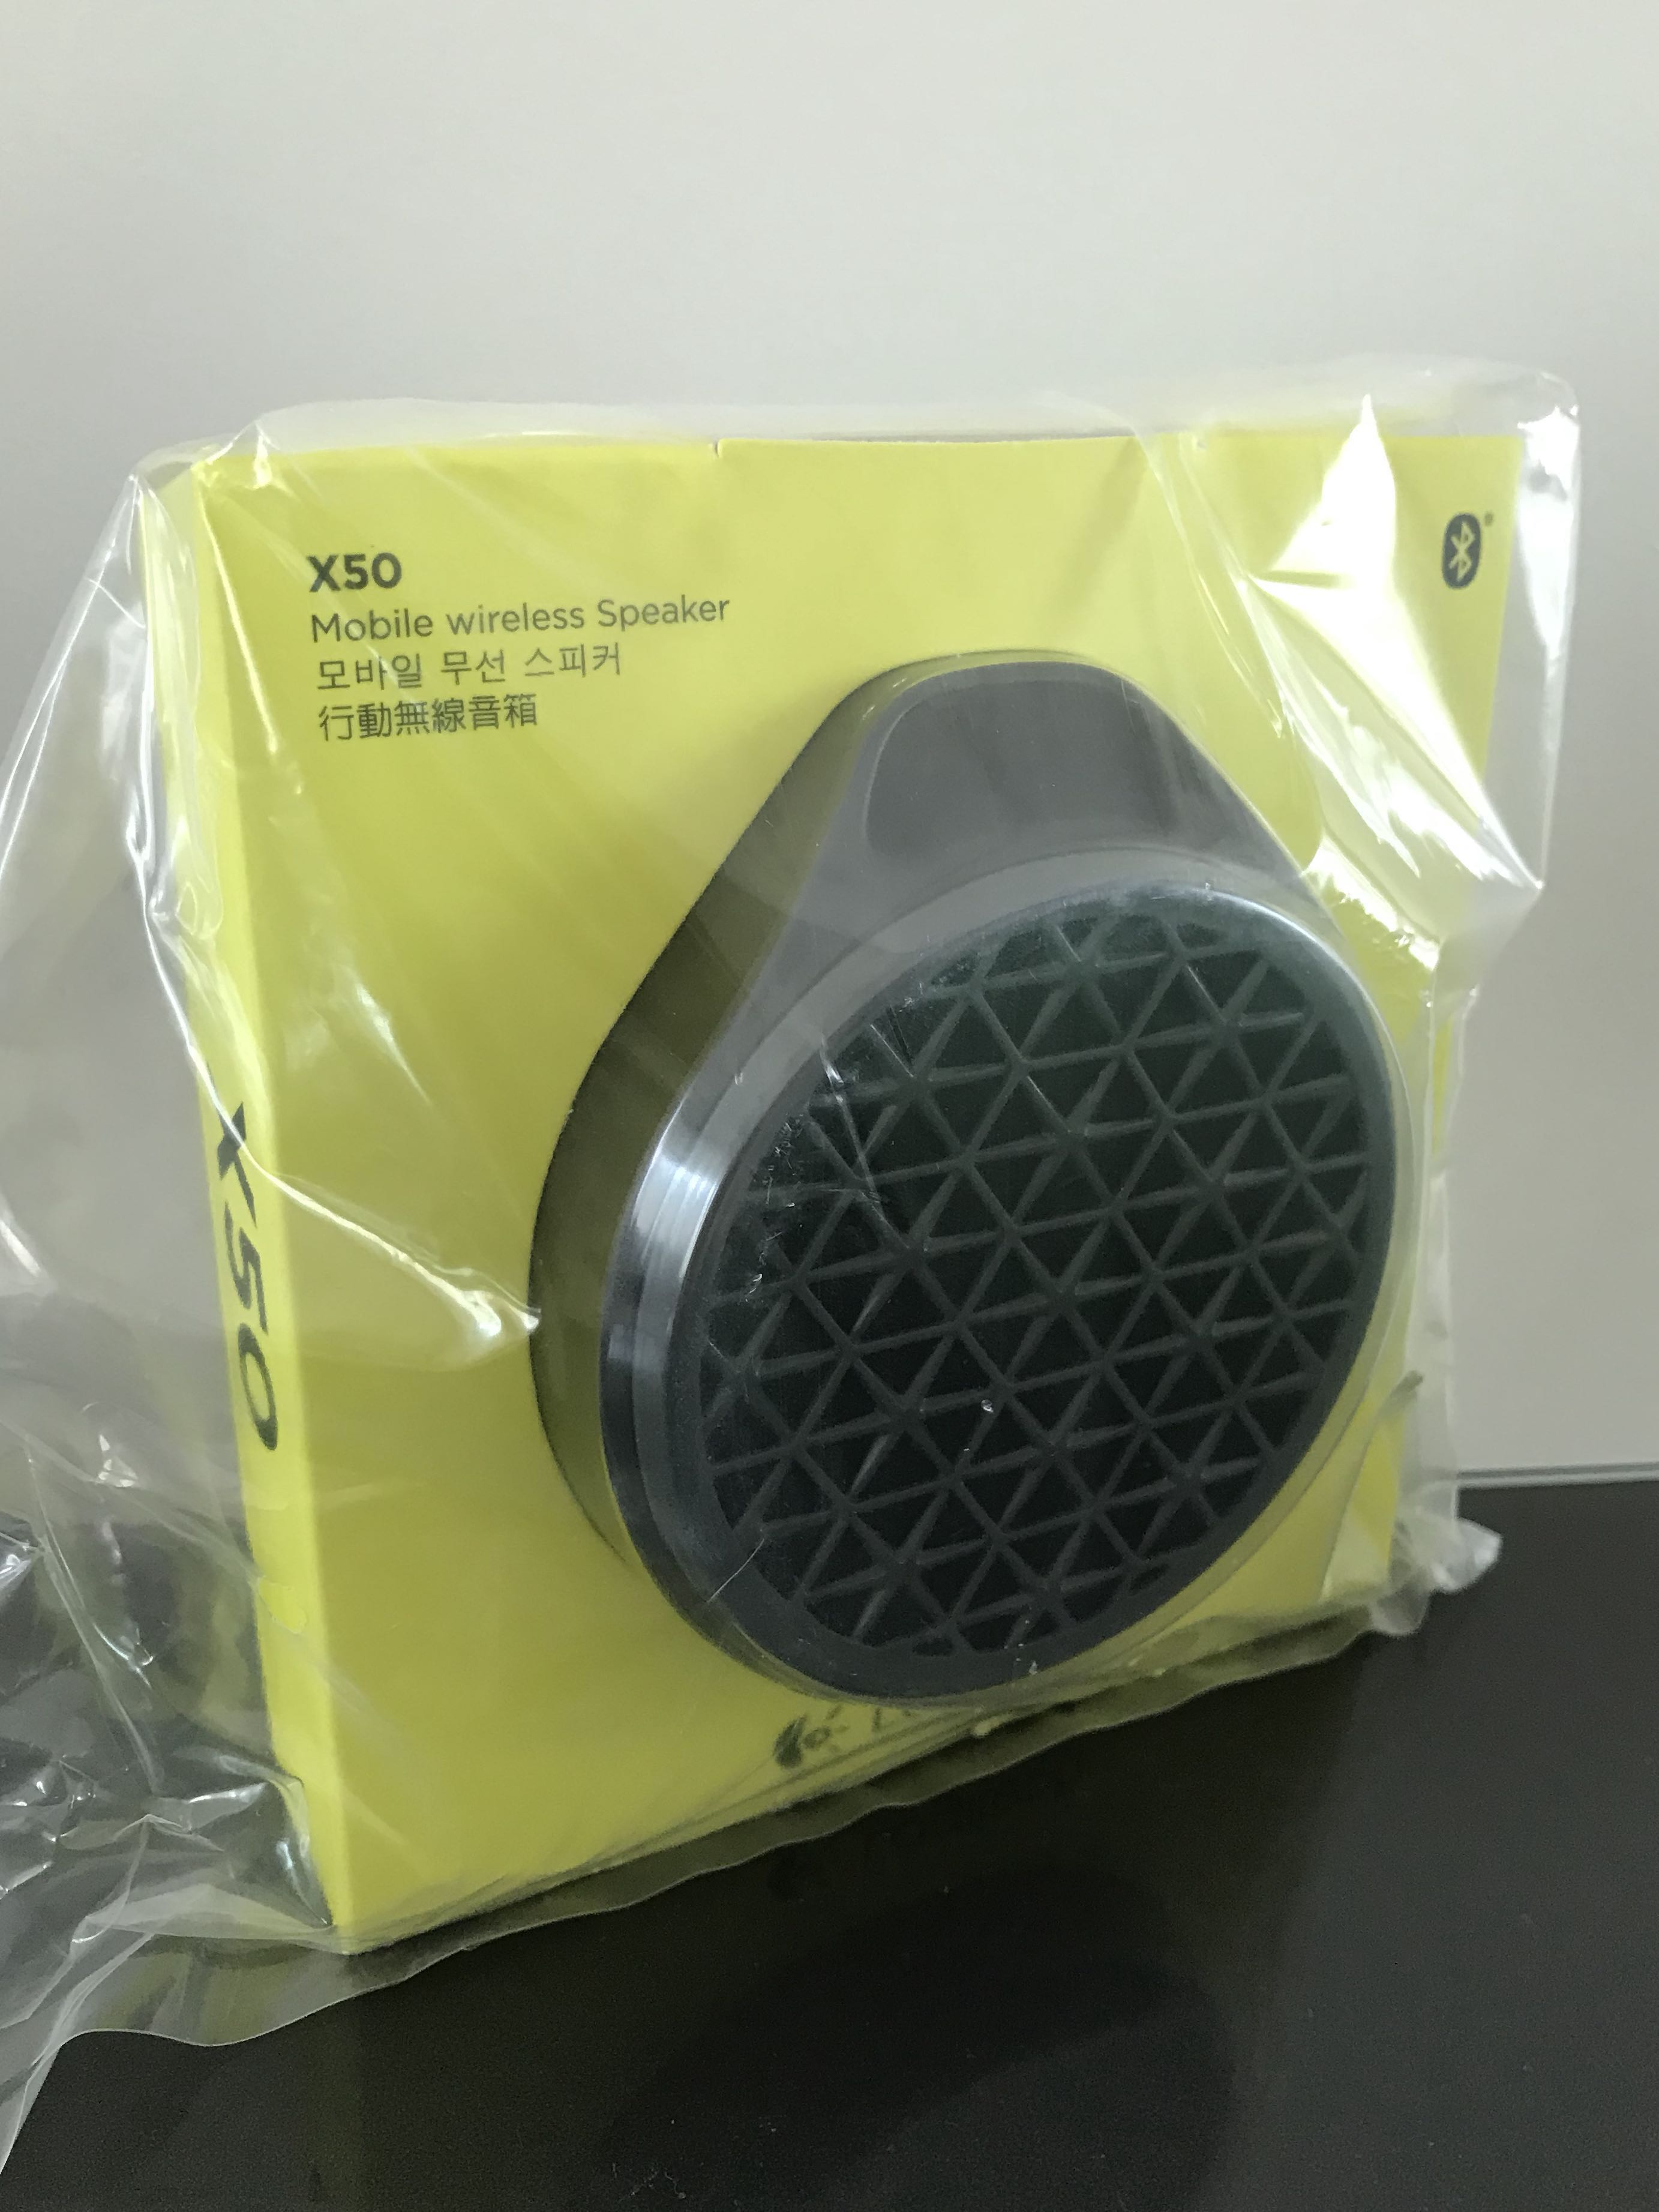 Logitech X50 Mobile Wireless Speaker Electronics Others On Carousell Bluetooth Photo